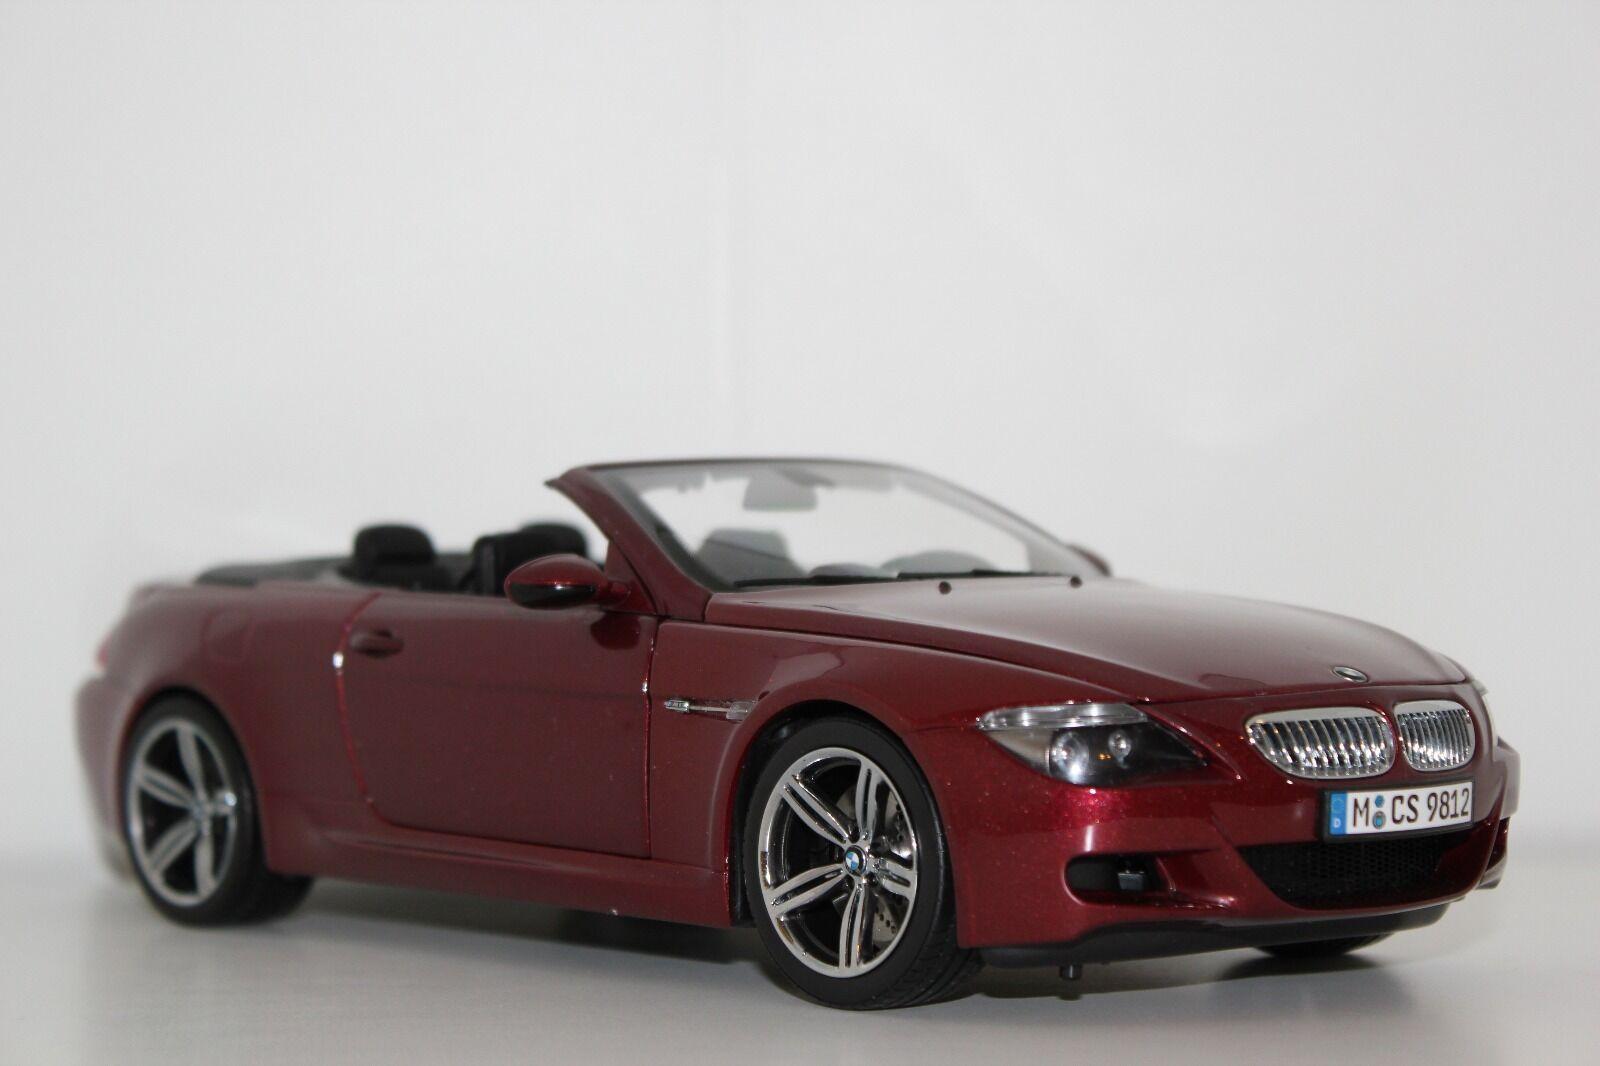 Kyosho BMW M6 E64 cabrio Indianapolis rot 80430417423 1 18 Dealer Edition